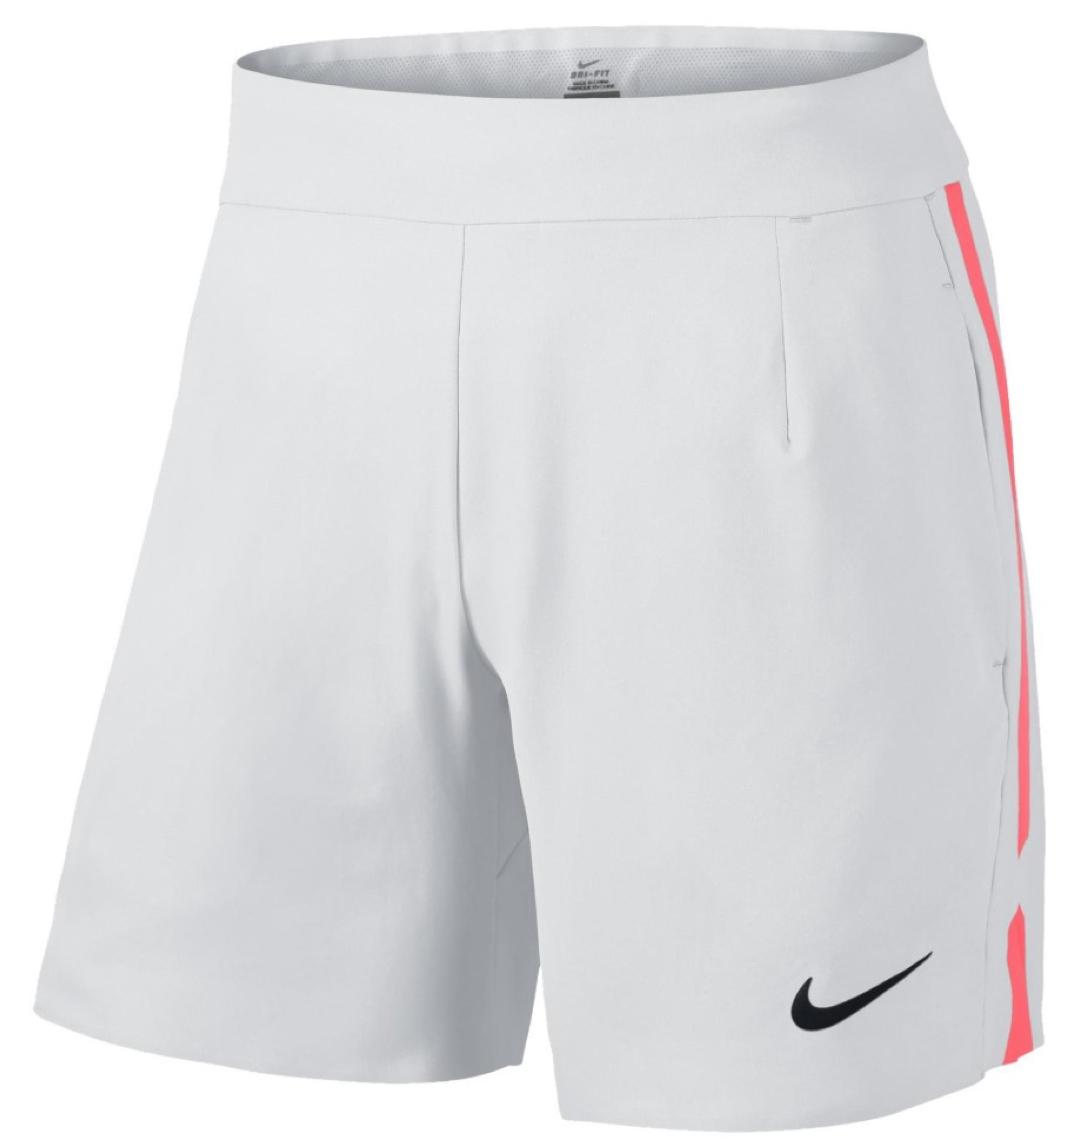 Federer US Open 2015 Night Shorts